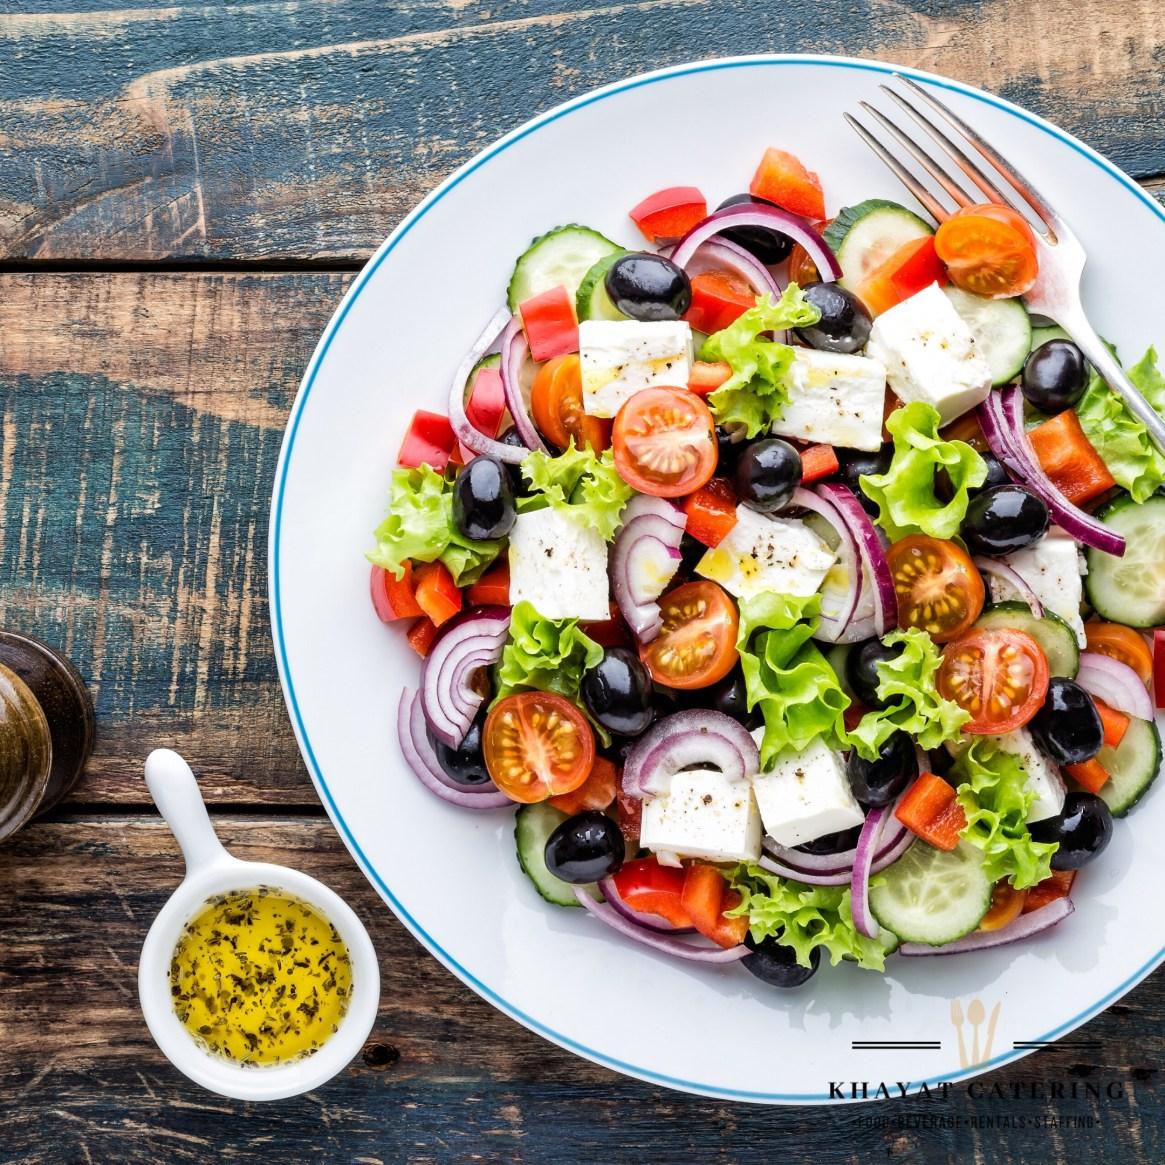 Khayat Catering greek salad